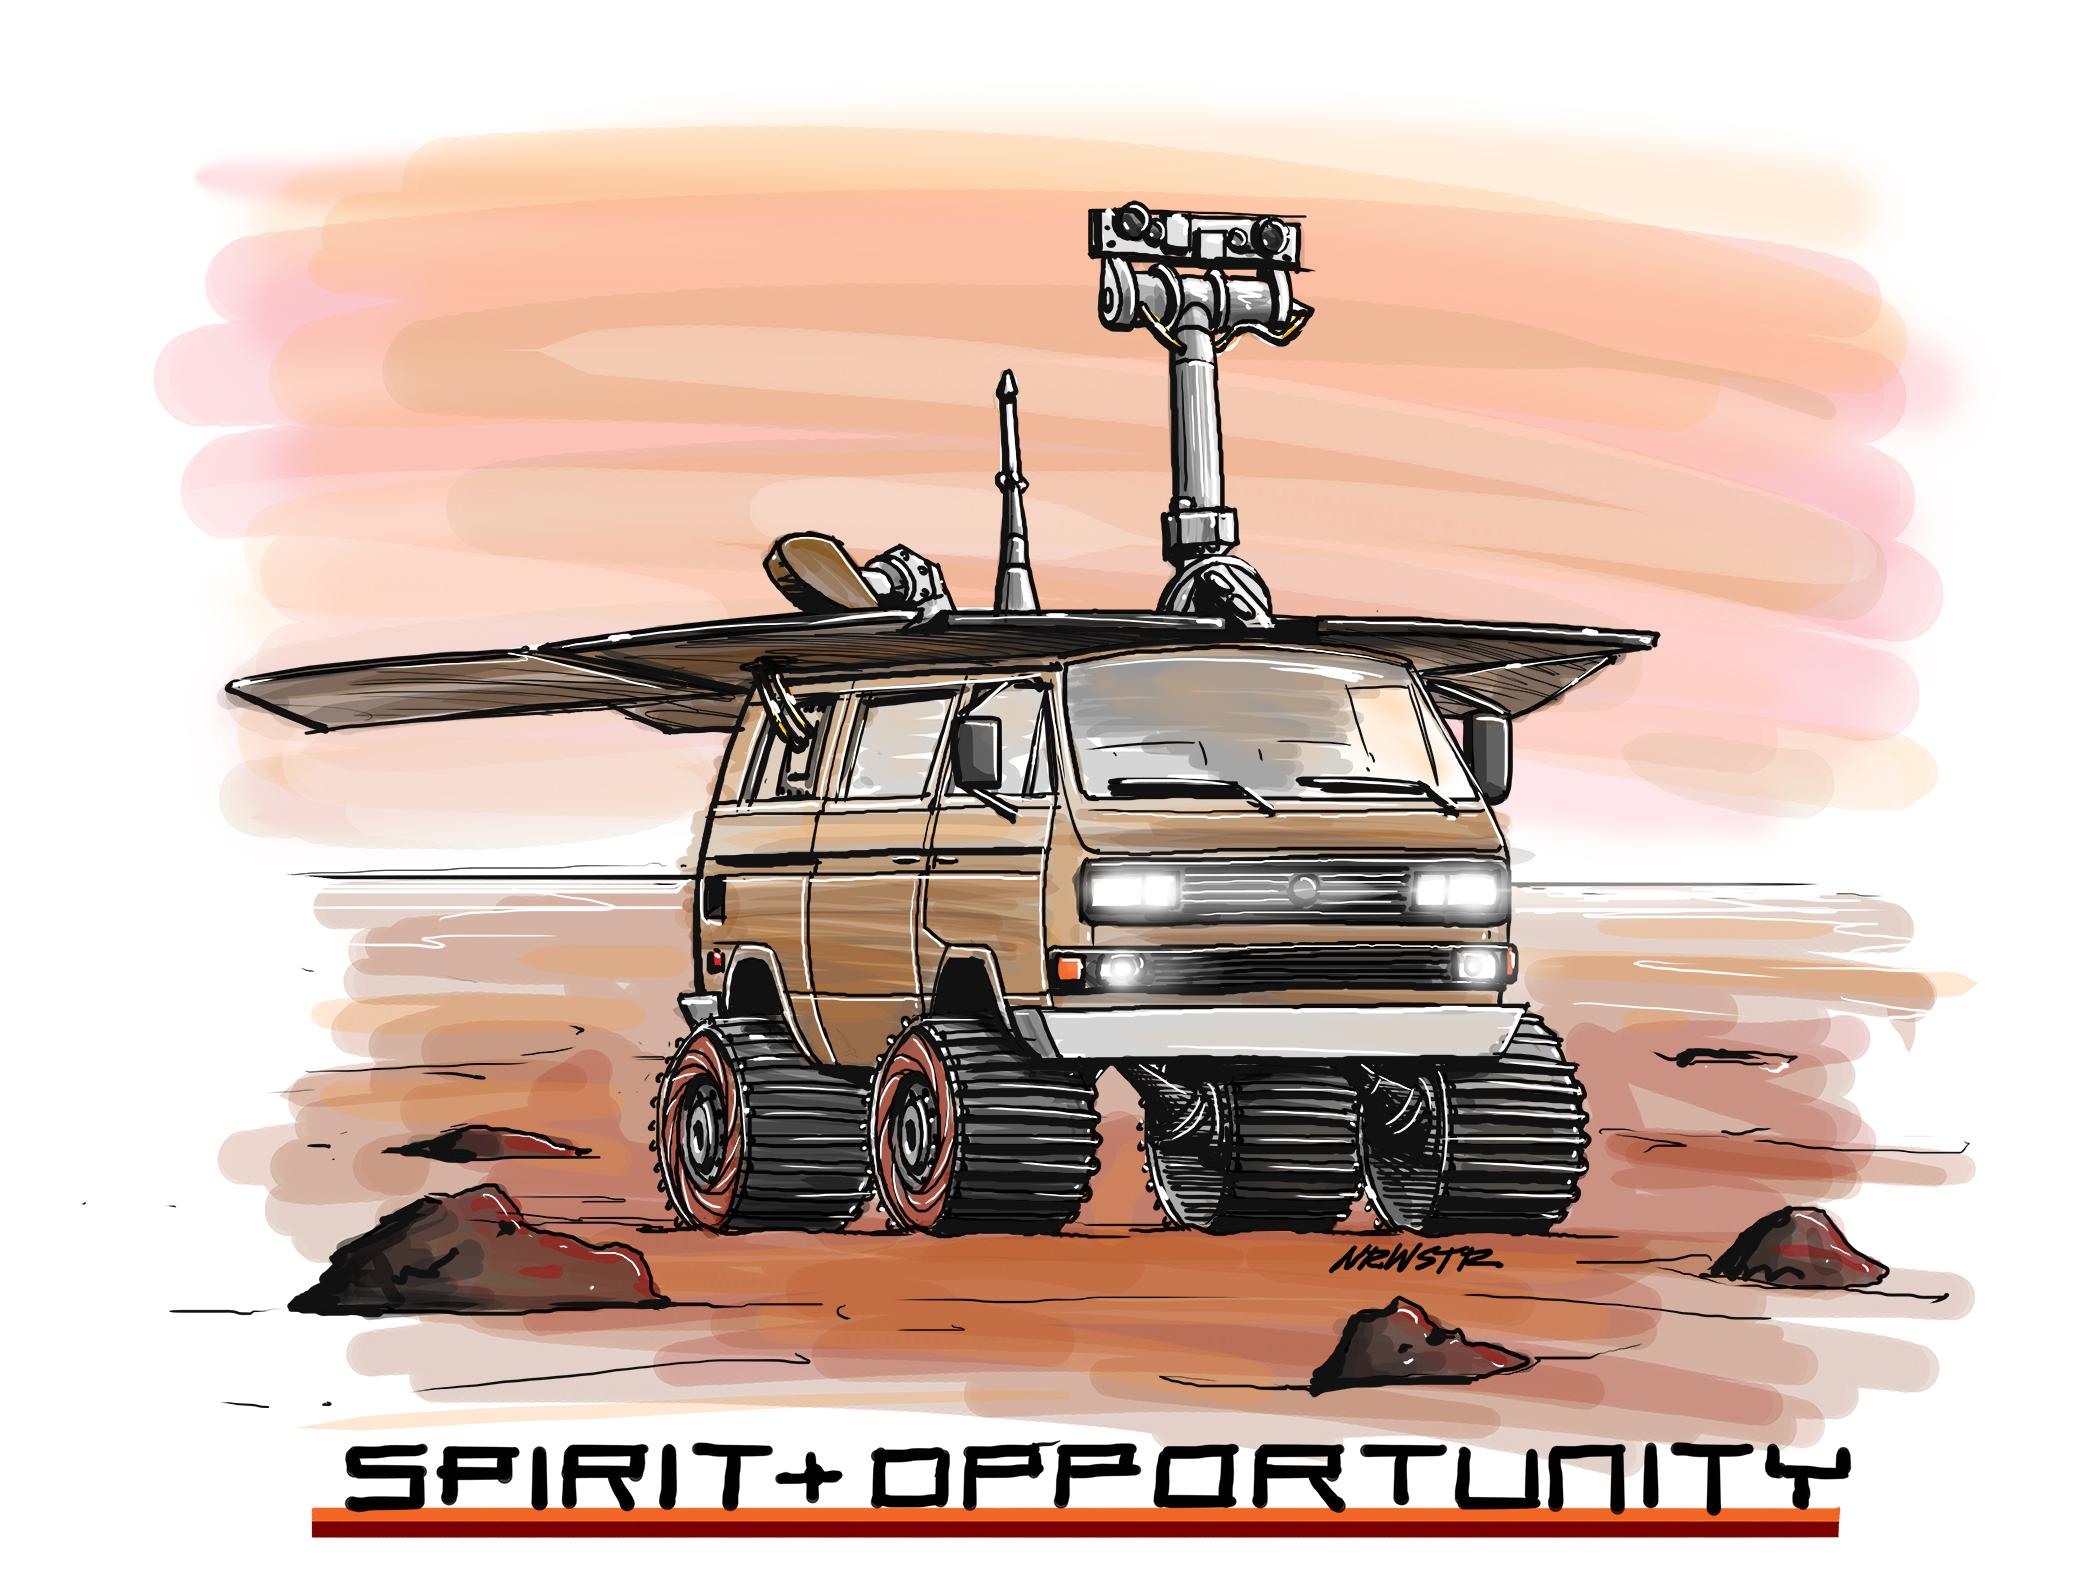 spirit-rover-sketch.jpg